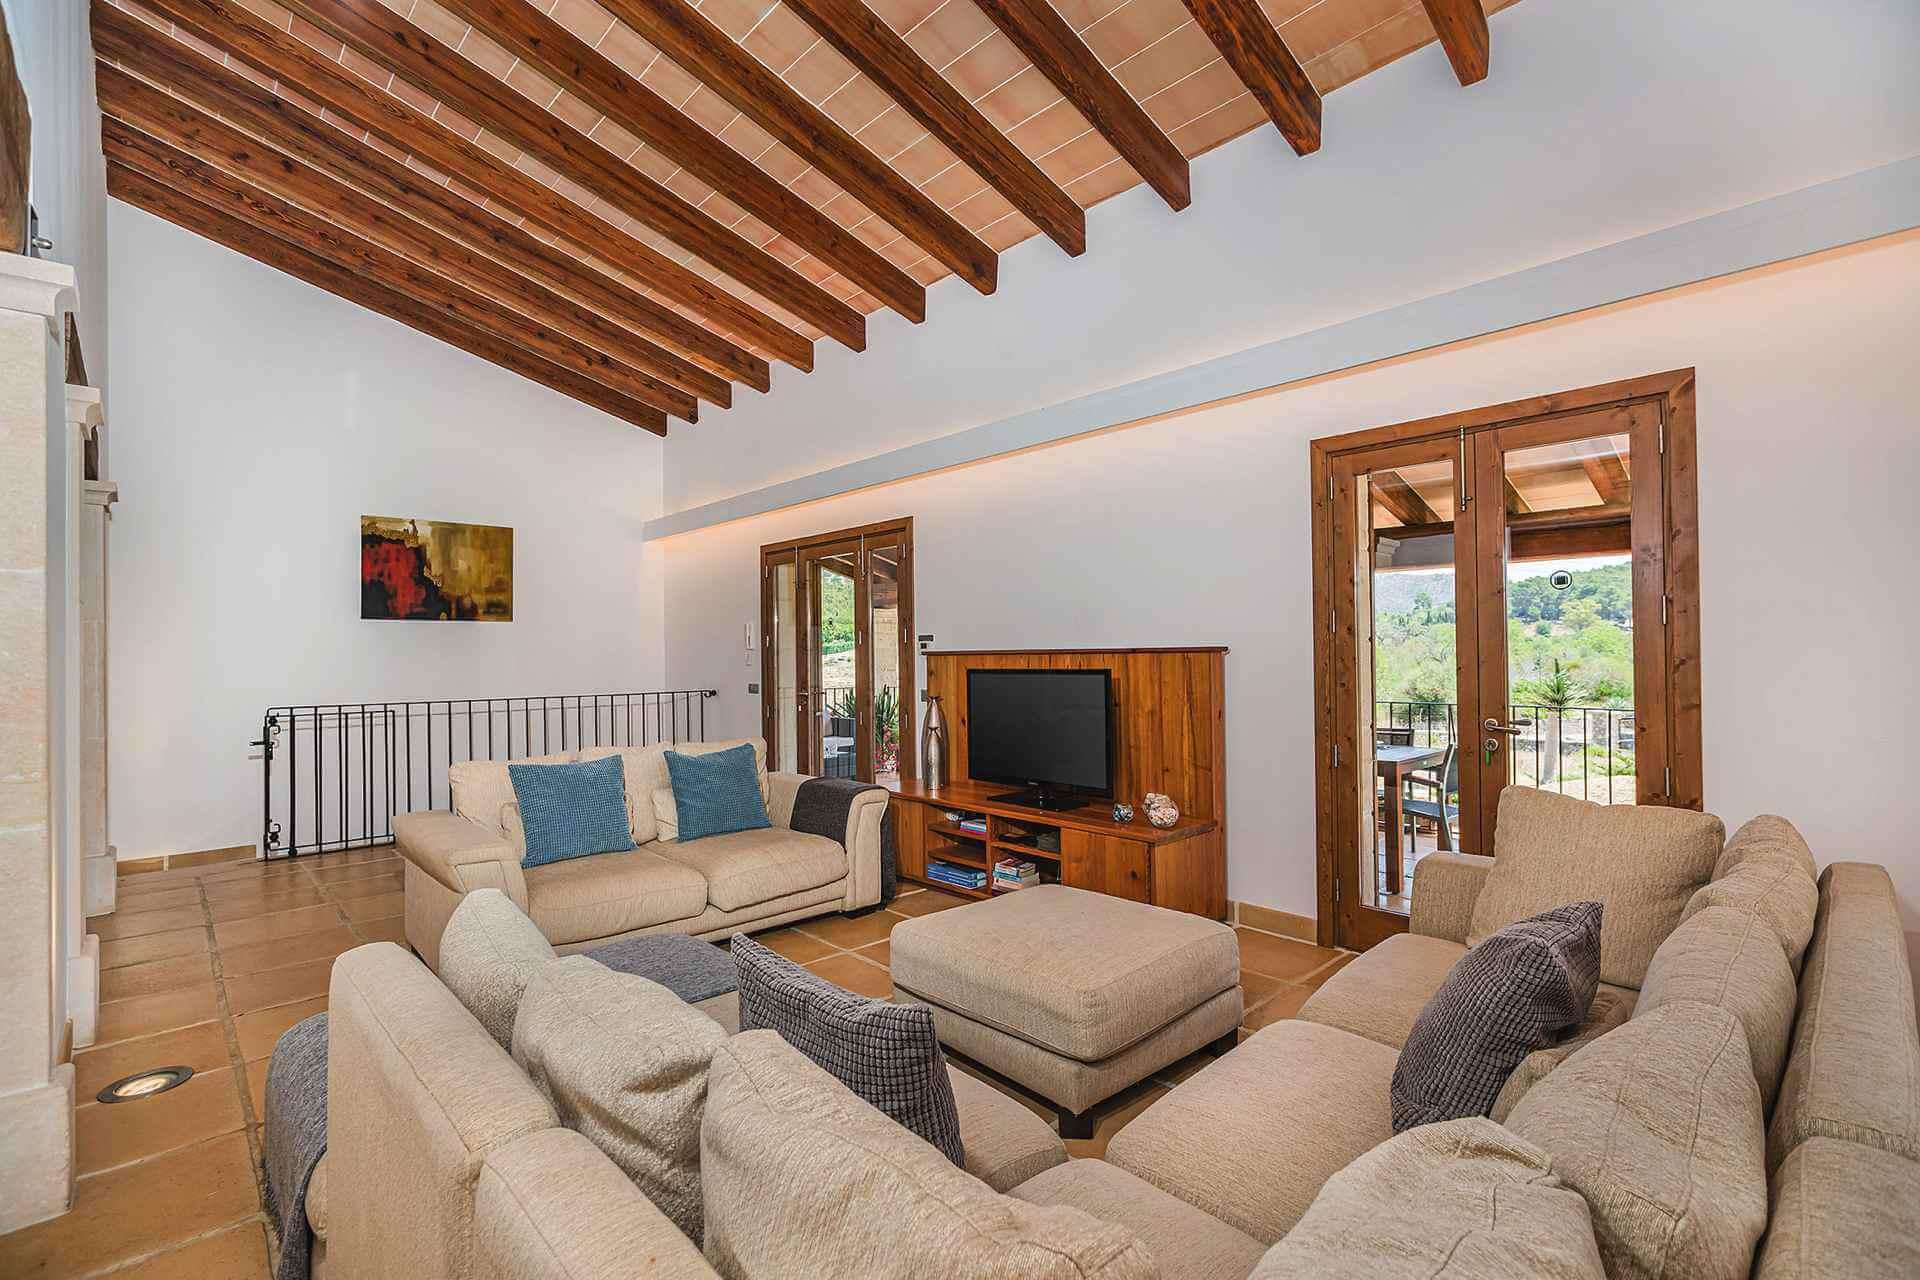 01-348 Luxus Familien Finca Norden Mallorca Bild 12